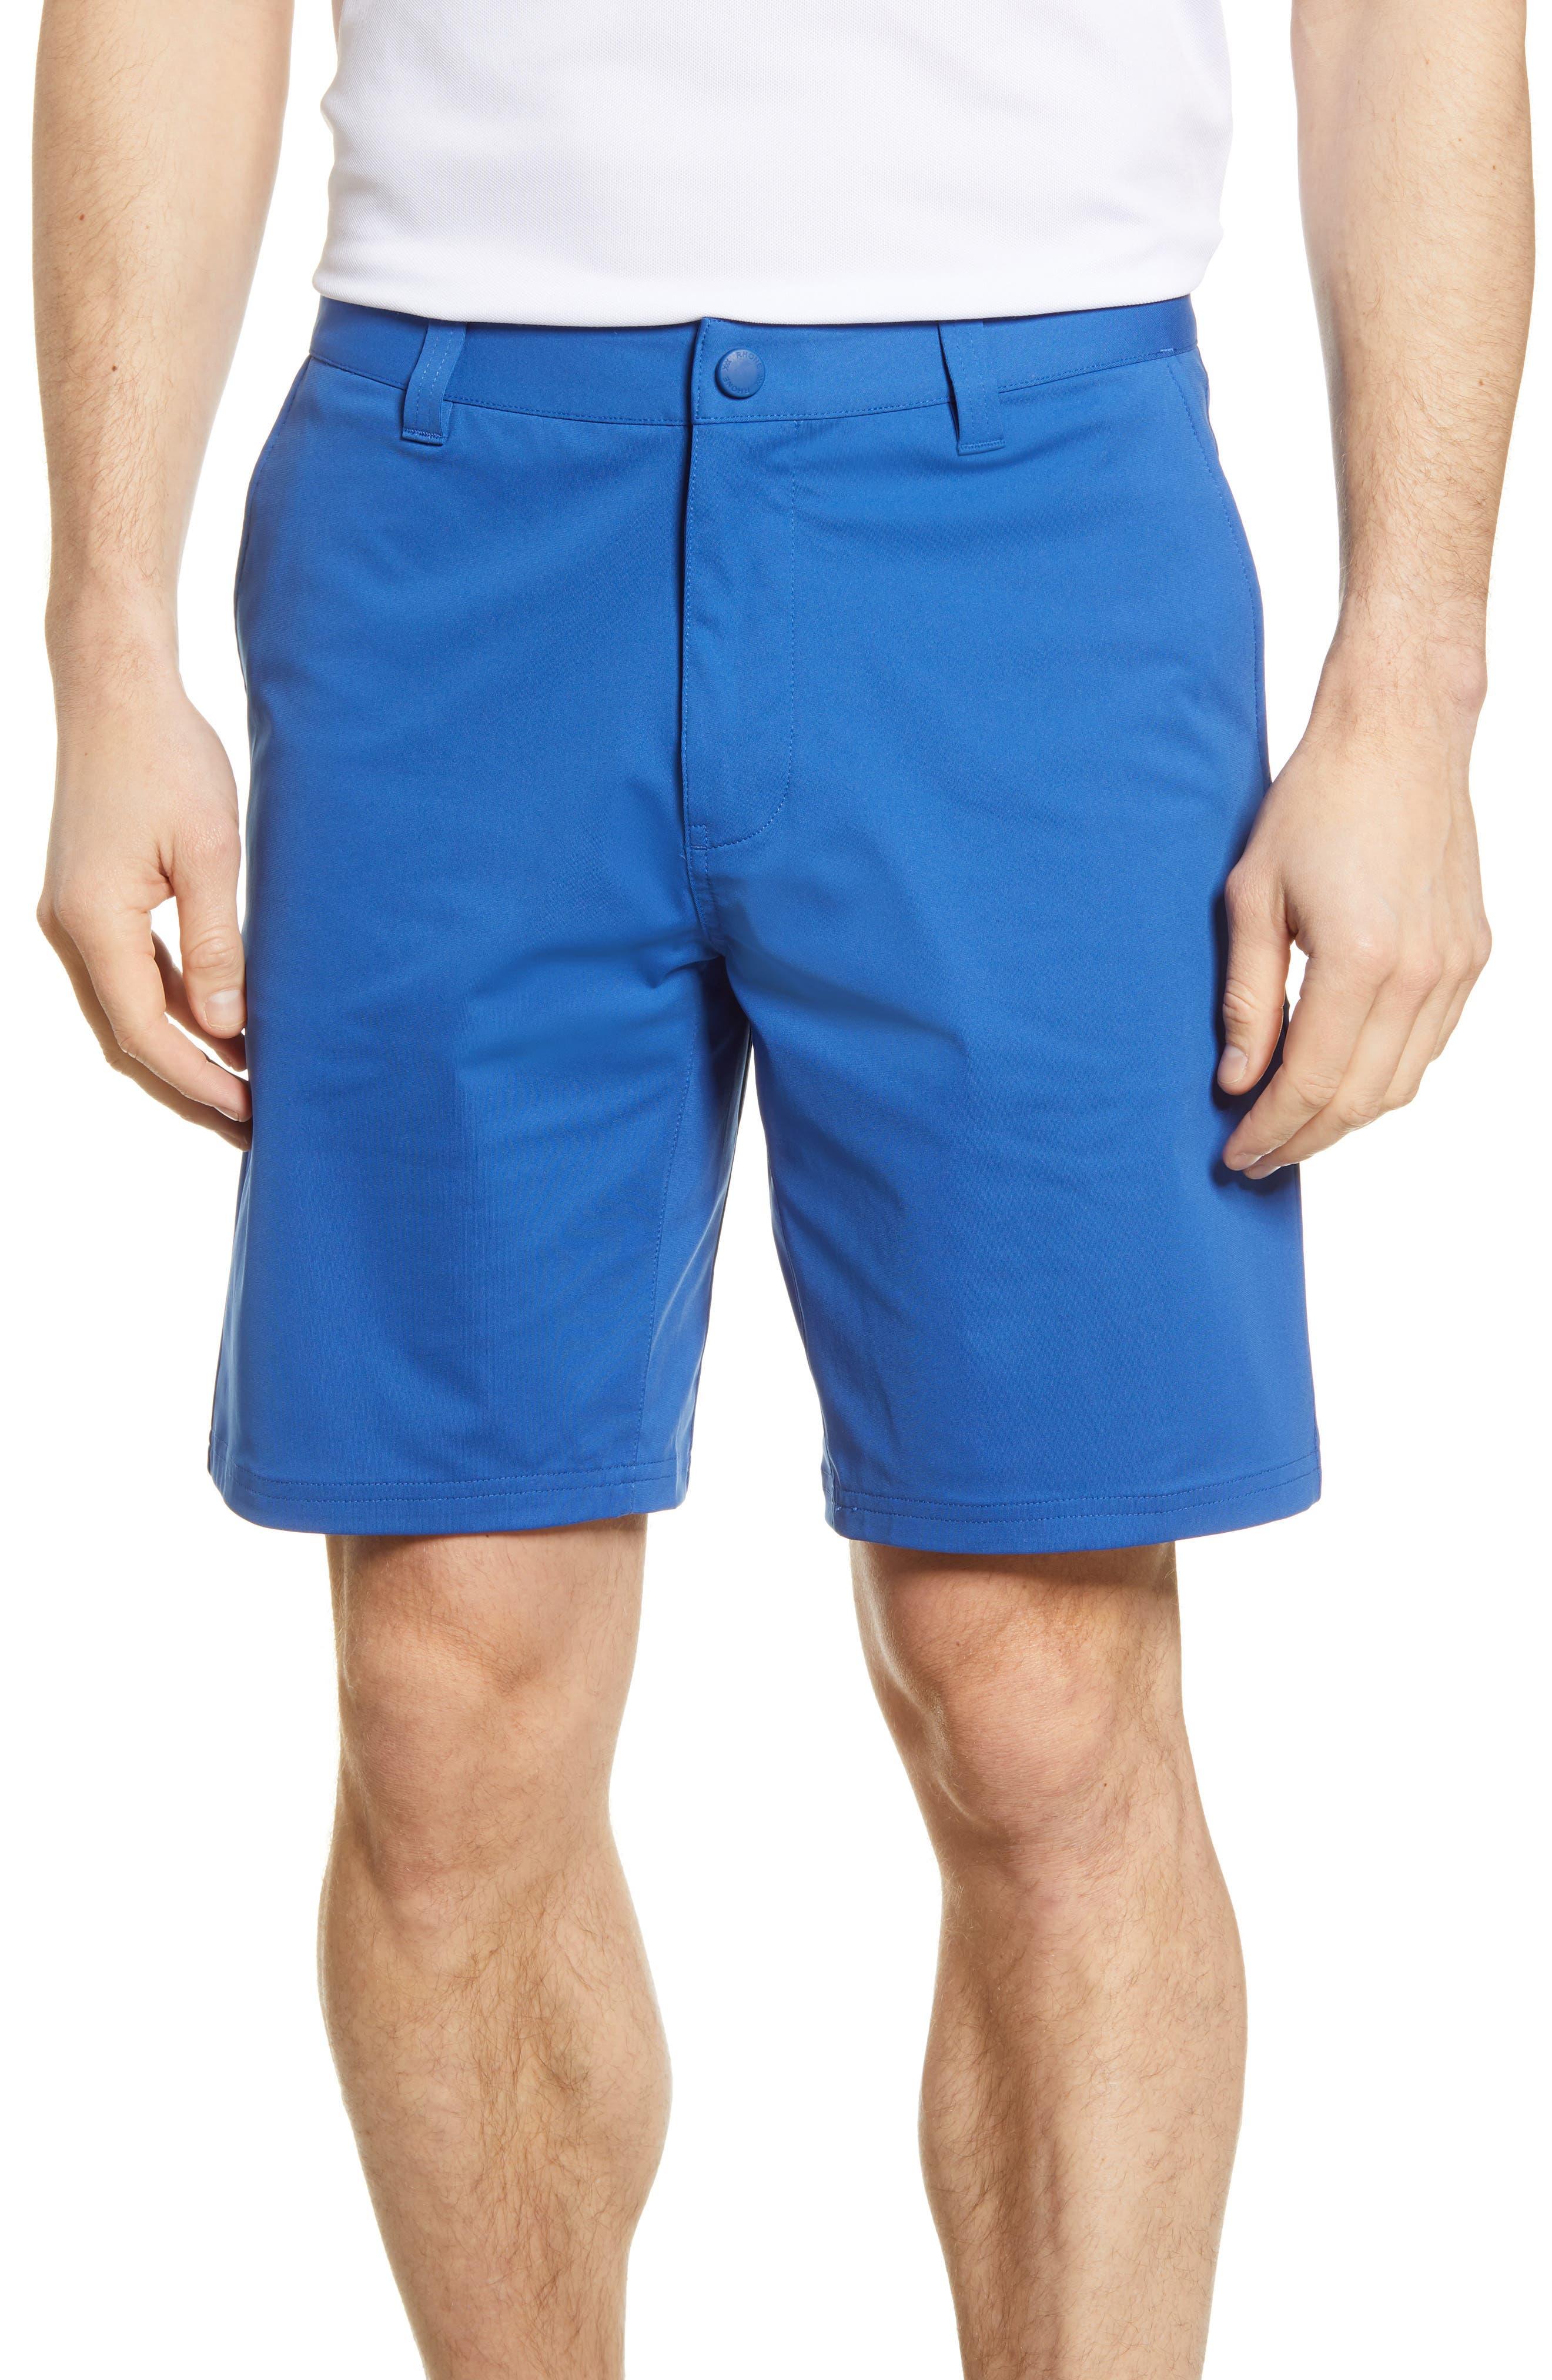 Image of RHONE Commuter Shorts